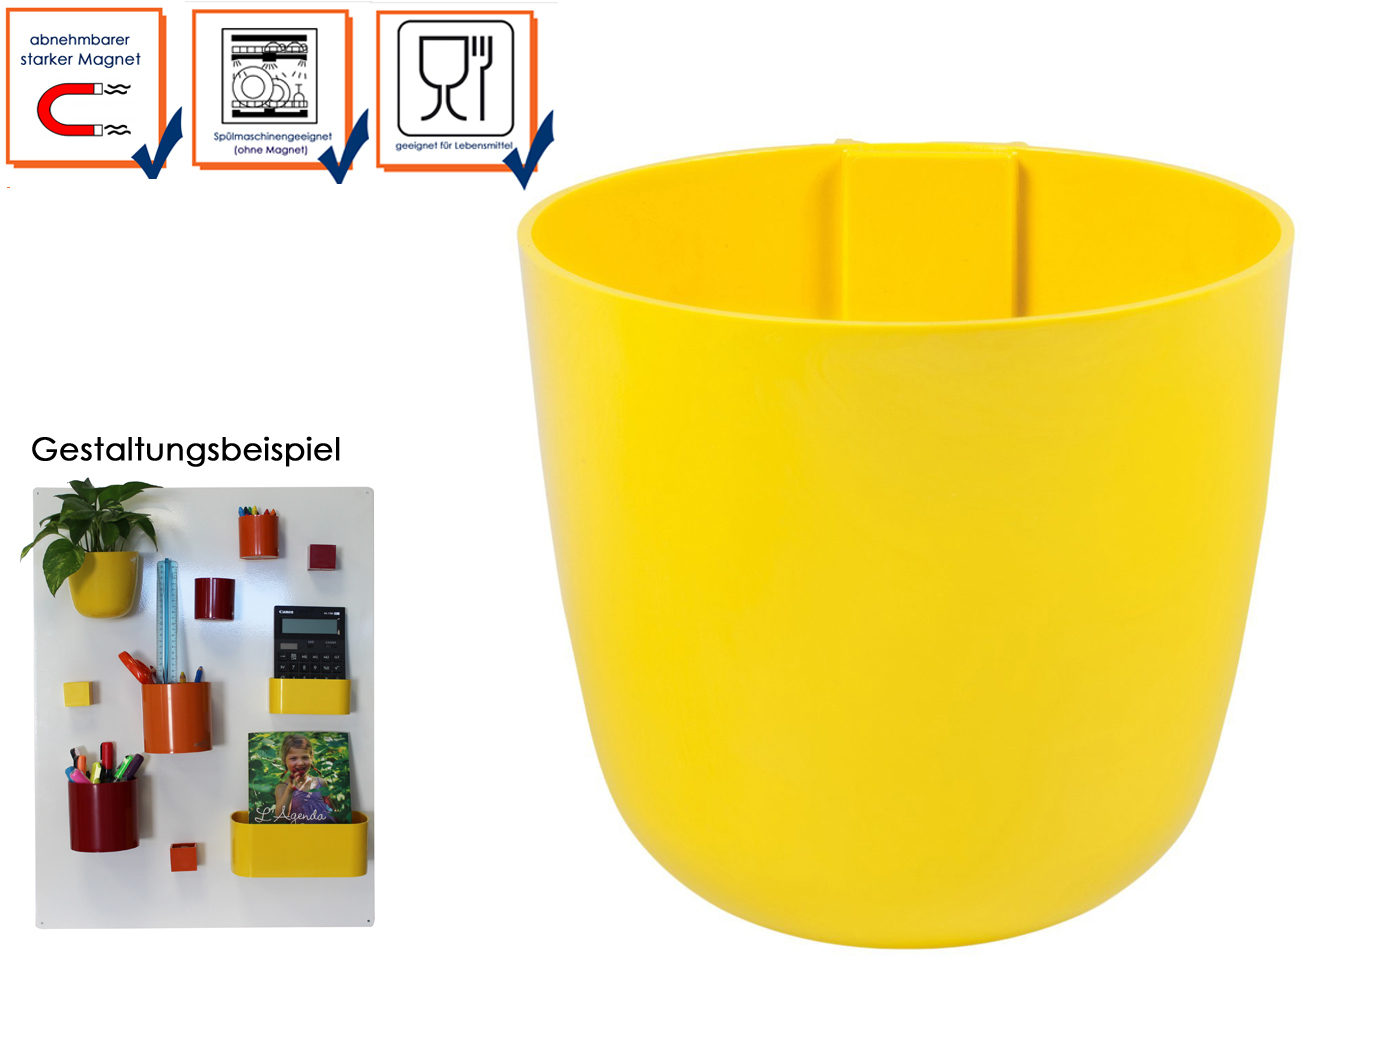 Limem Kunststofftopf mit Magnet Ø 10 cm KalaMitica Wandaufbewahrung Wanddeko